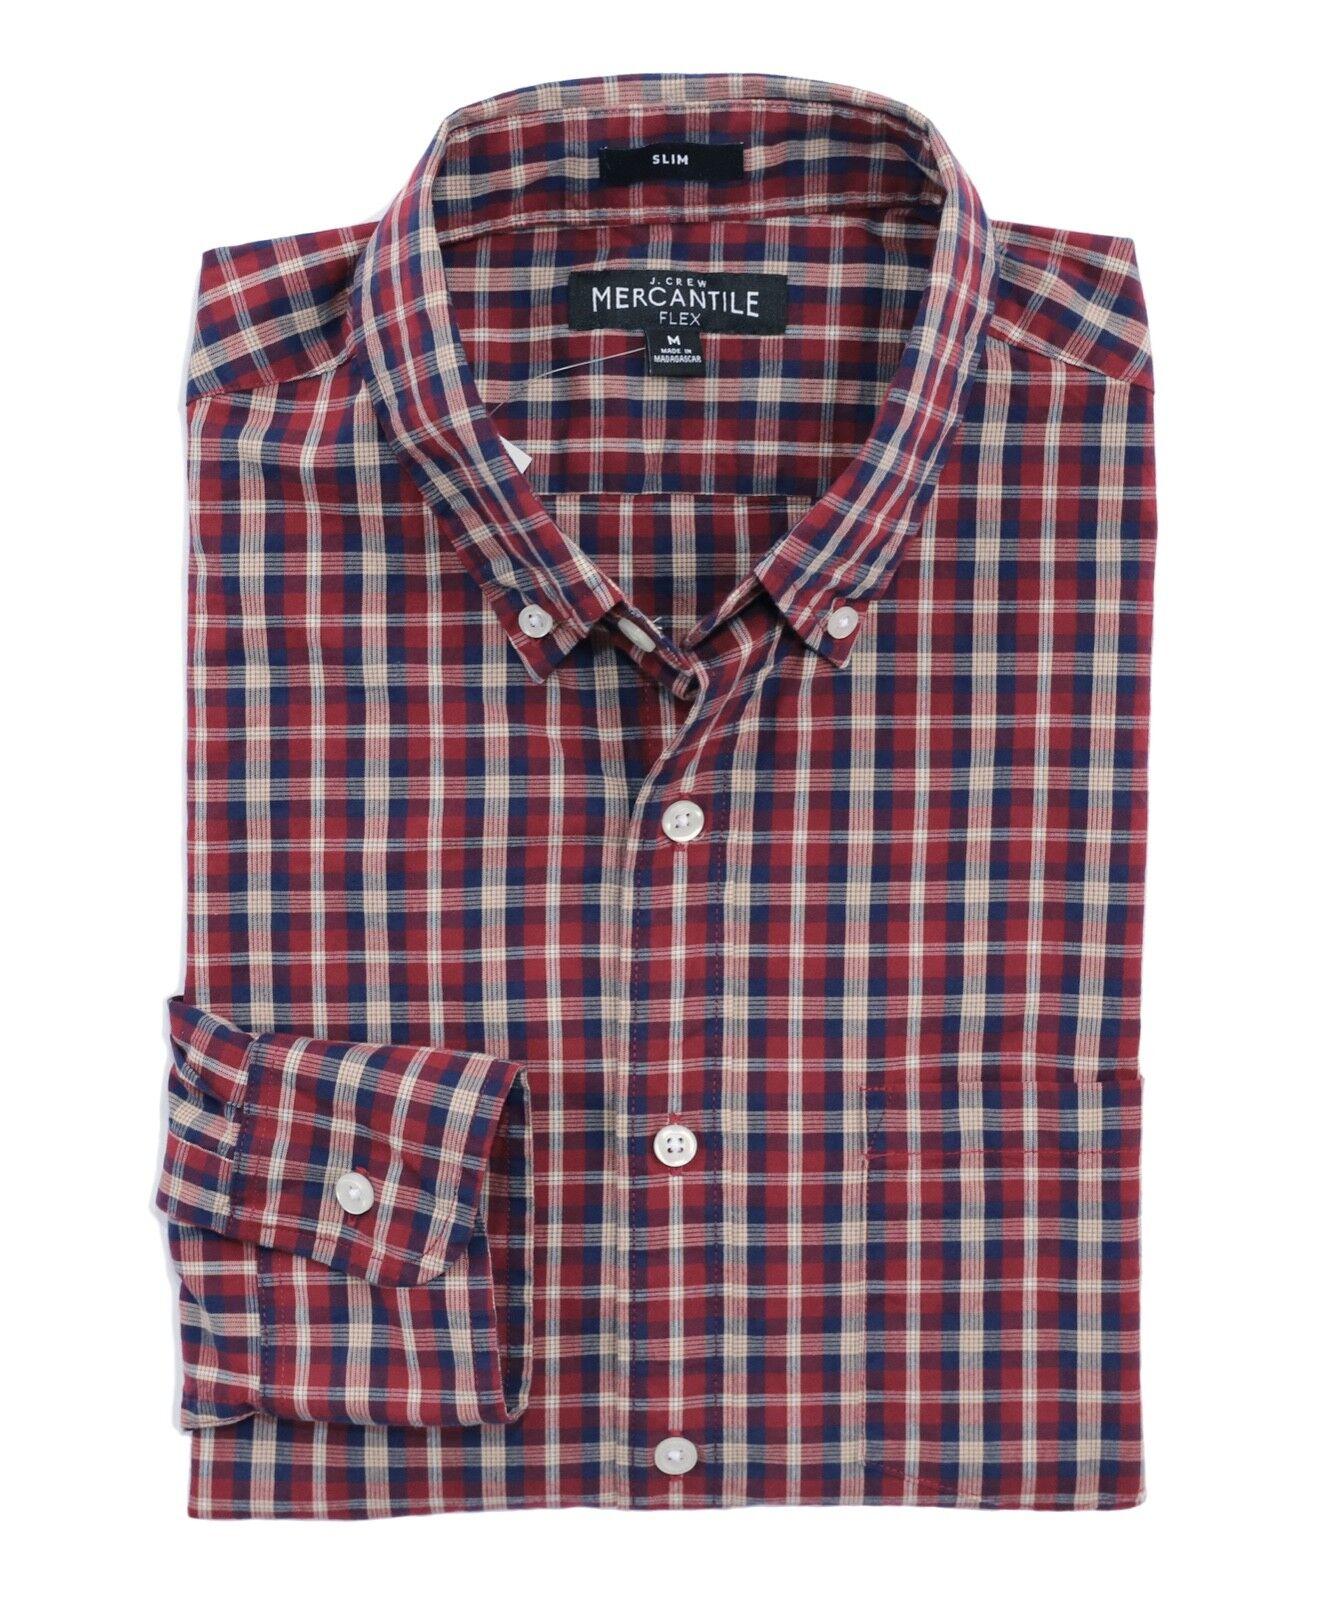 J.Crew Mercantile Mens S Slim Fit - NWT - Red Navy Plaid Flex Washed Shirt